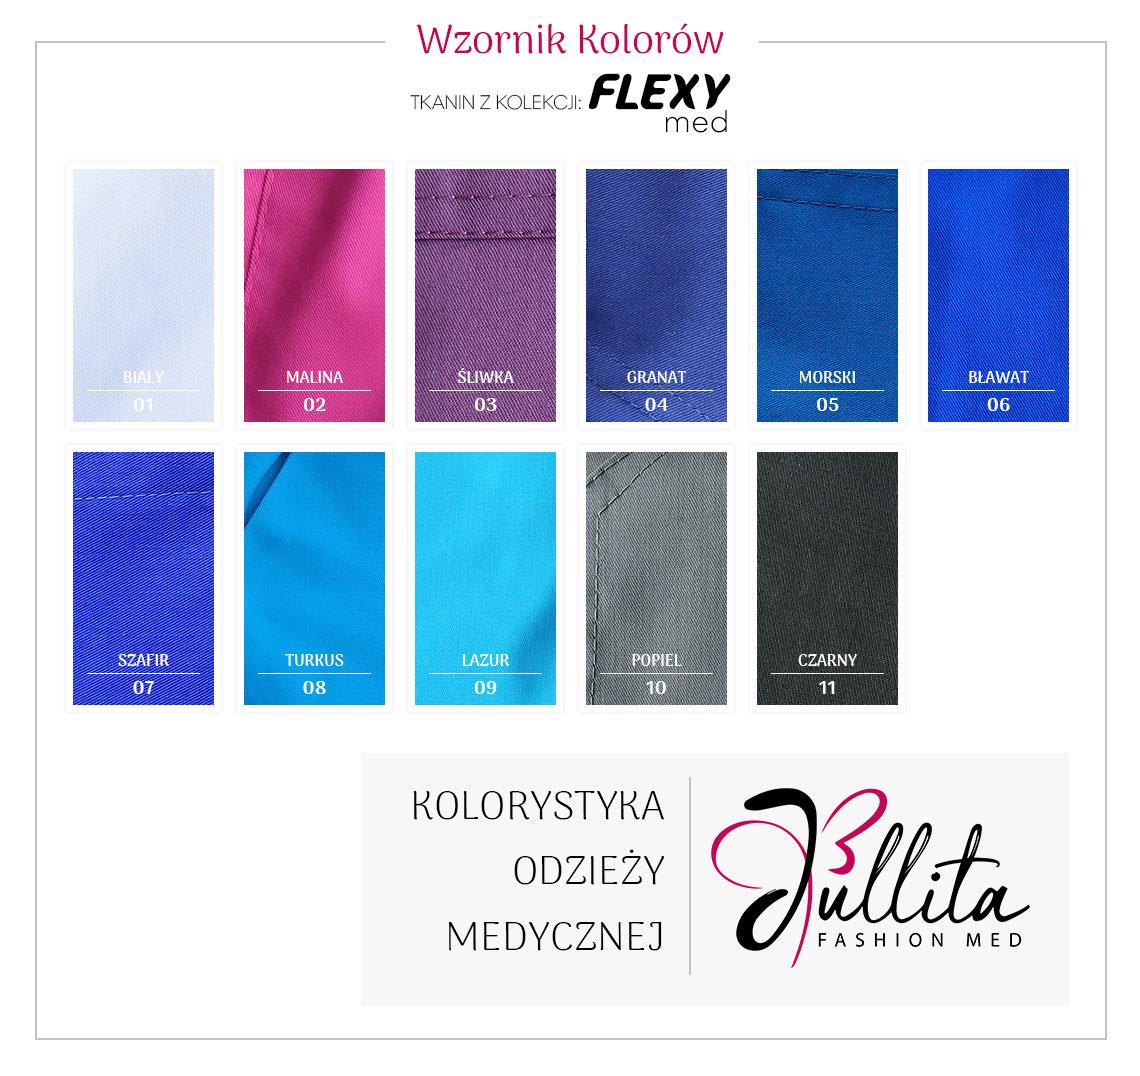 wzornik kolorow Jullita - Flexy Med